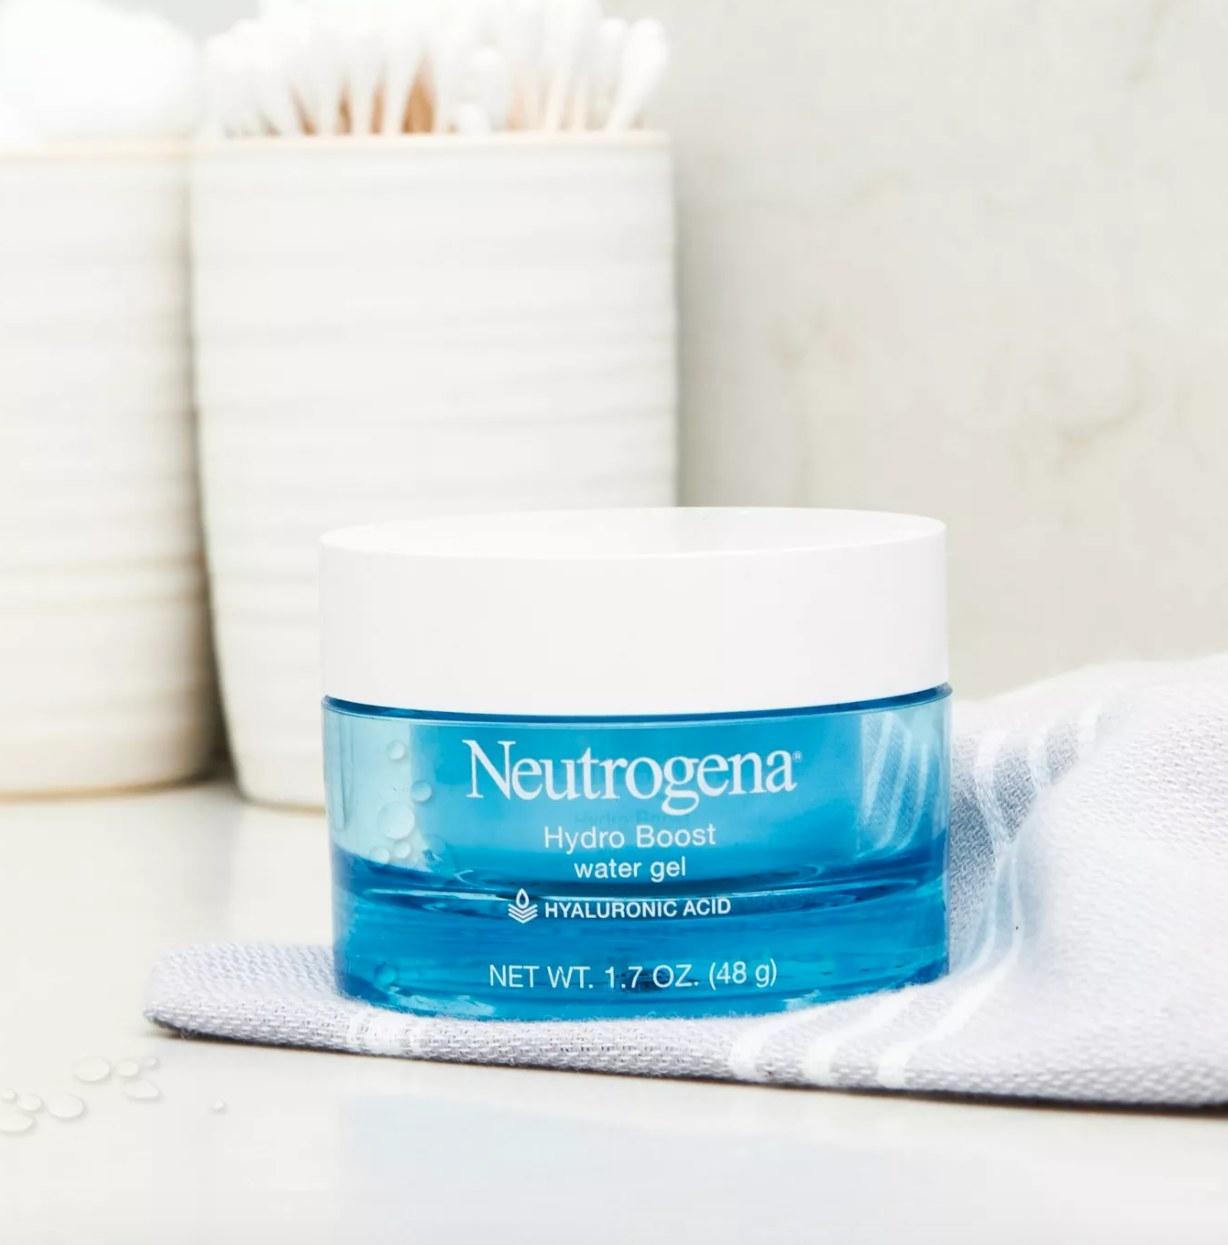 neutrogena hydro boost on towel